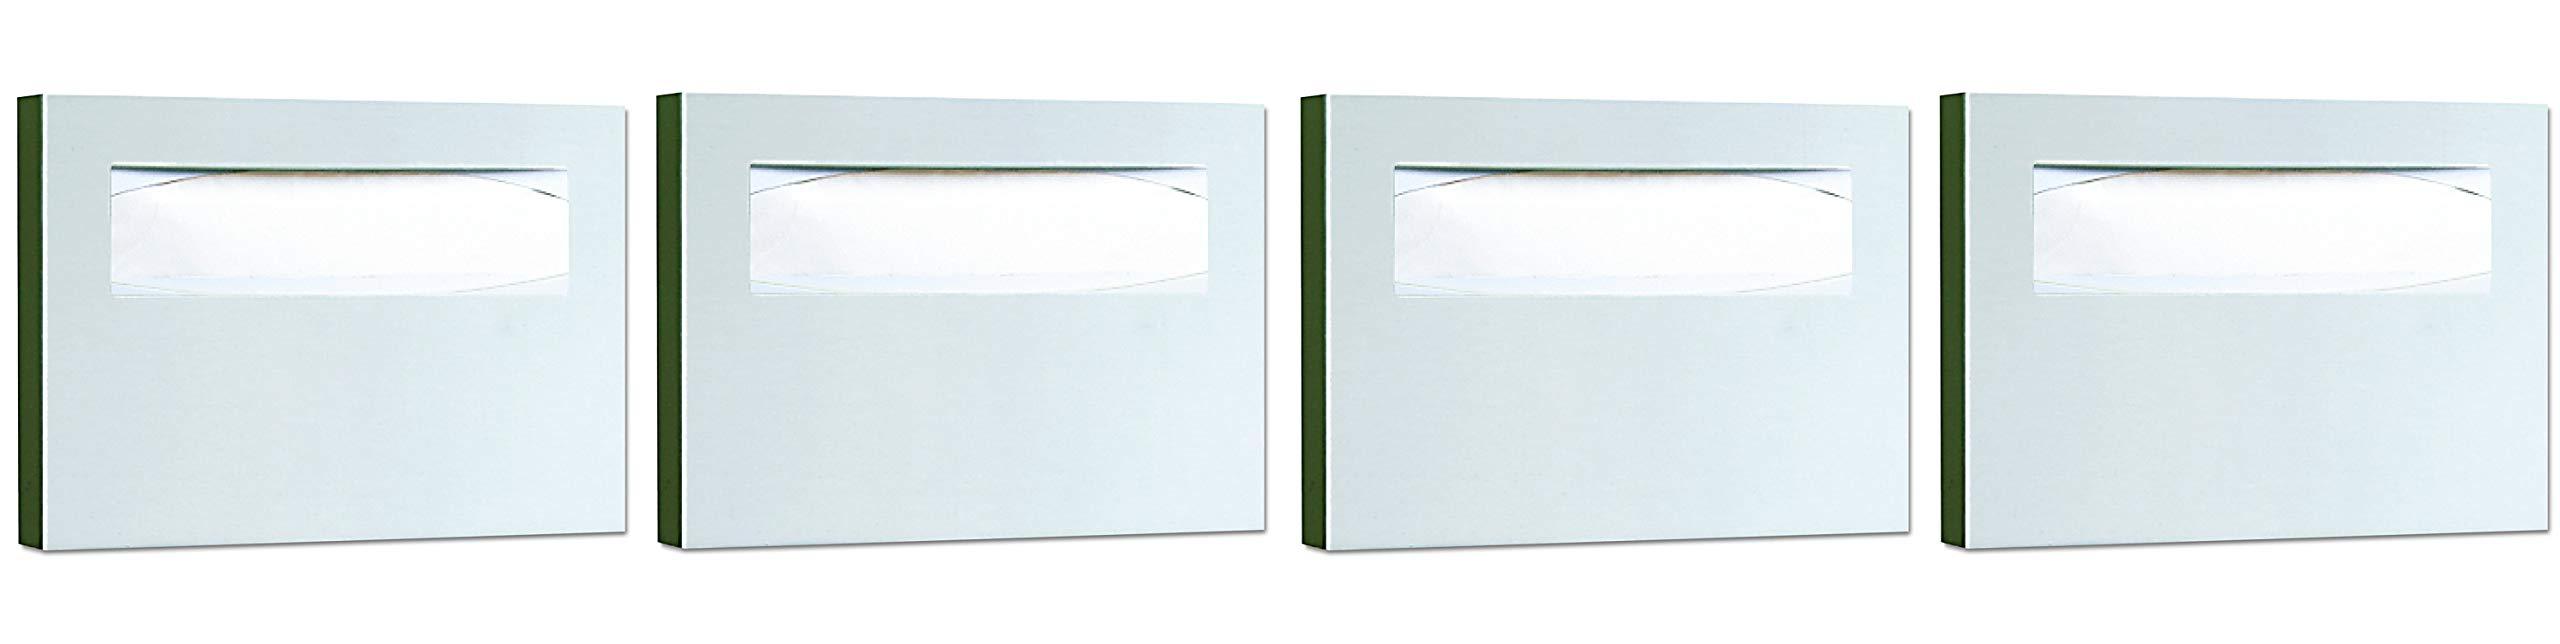 Bobrick 221 Stainless Steel Toilet Seat Cover Dispenser, 15 3/4 x 2 x 11, Satin Finish (Pack of 4)